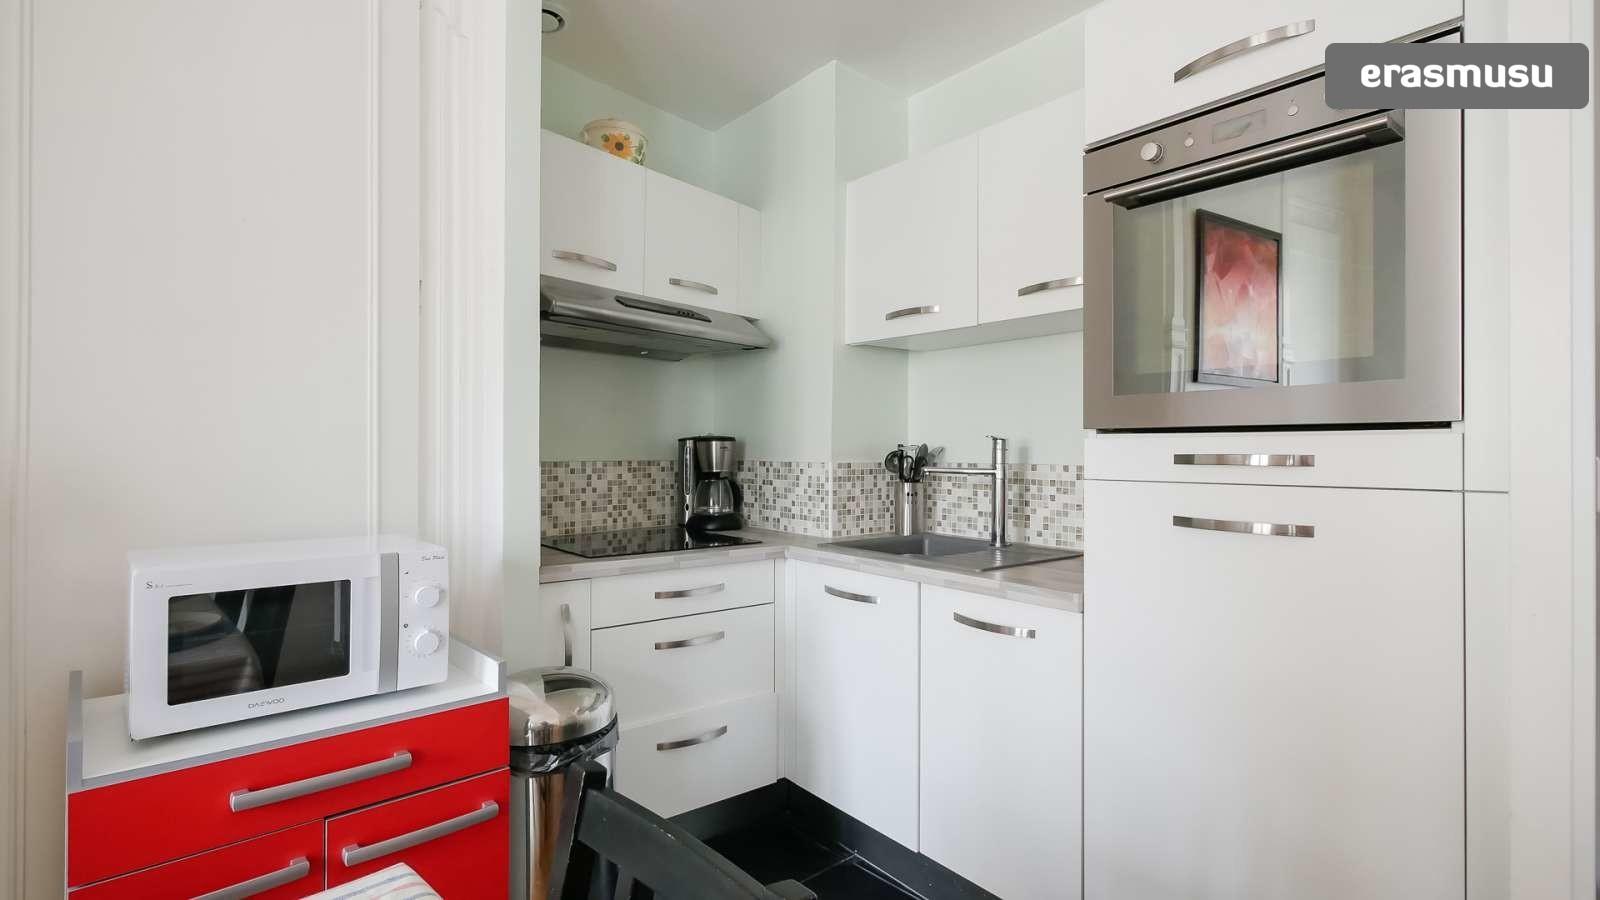 spacious-2-bedroom-apartment-rent-cordeliers-8f0a9277e741bdf2499